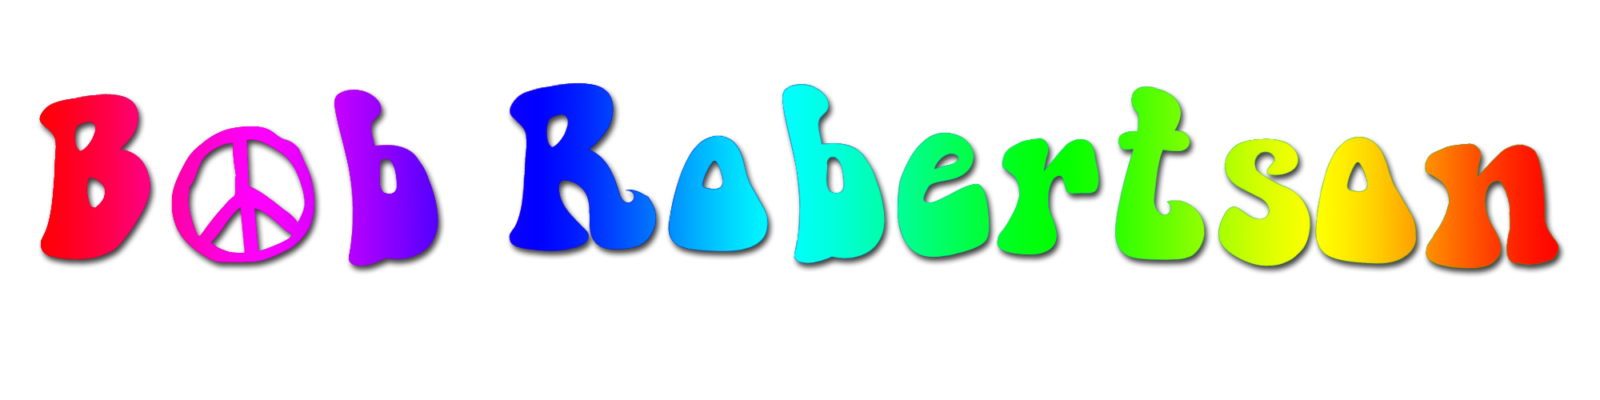 "Bob ""the flower"" Robertson Bob ""the flower"" Robertson LOGOBOB 1600x400"